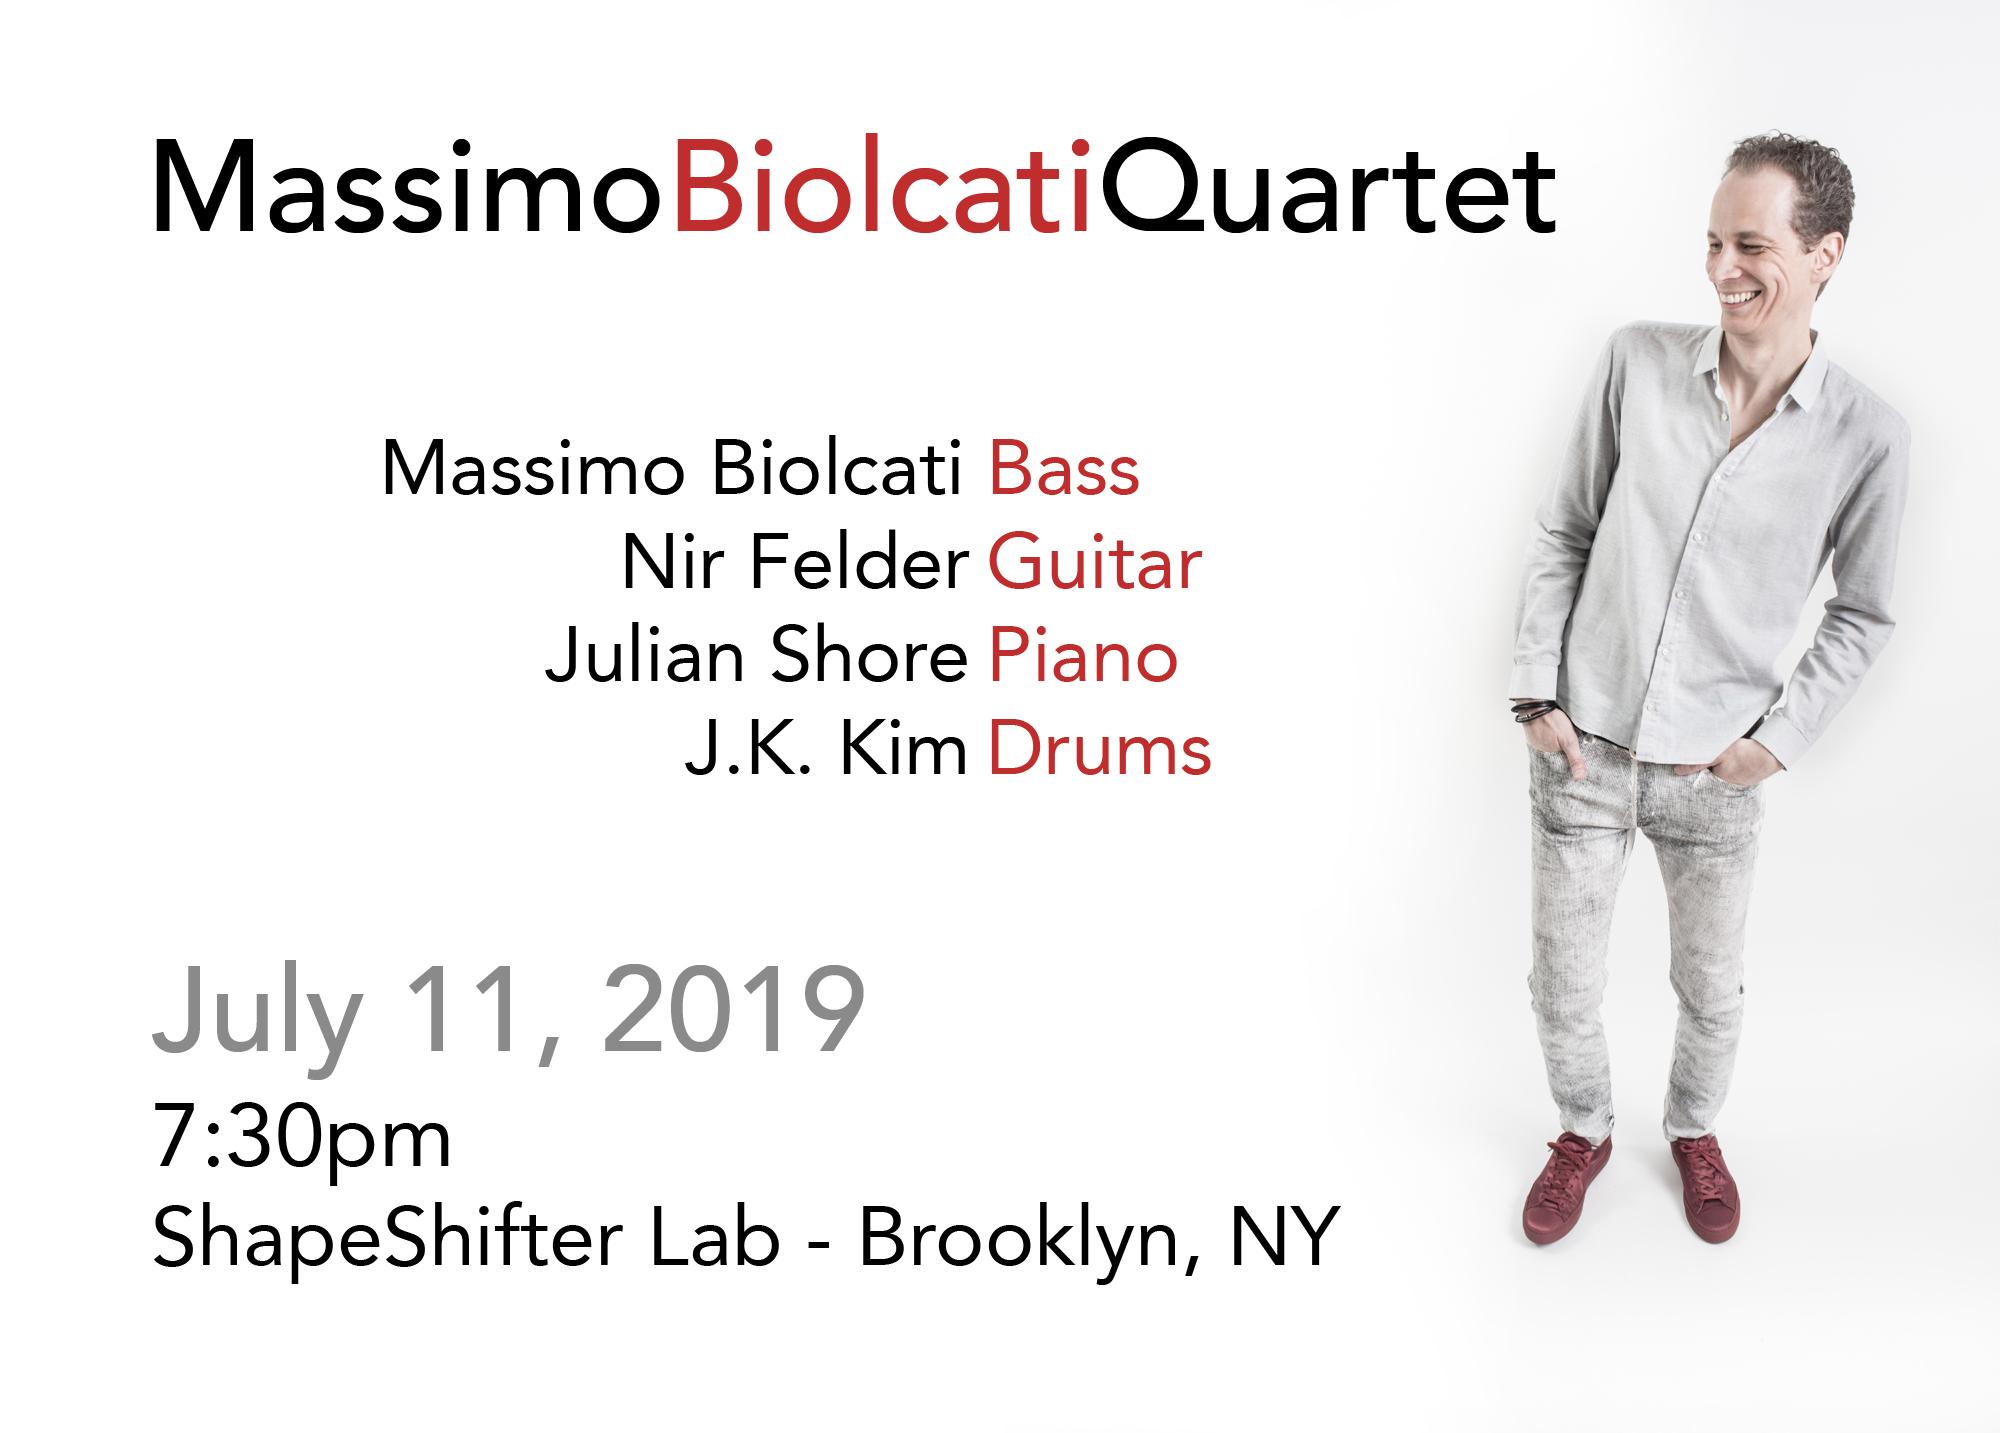 Massimo Biolcati Quartet